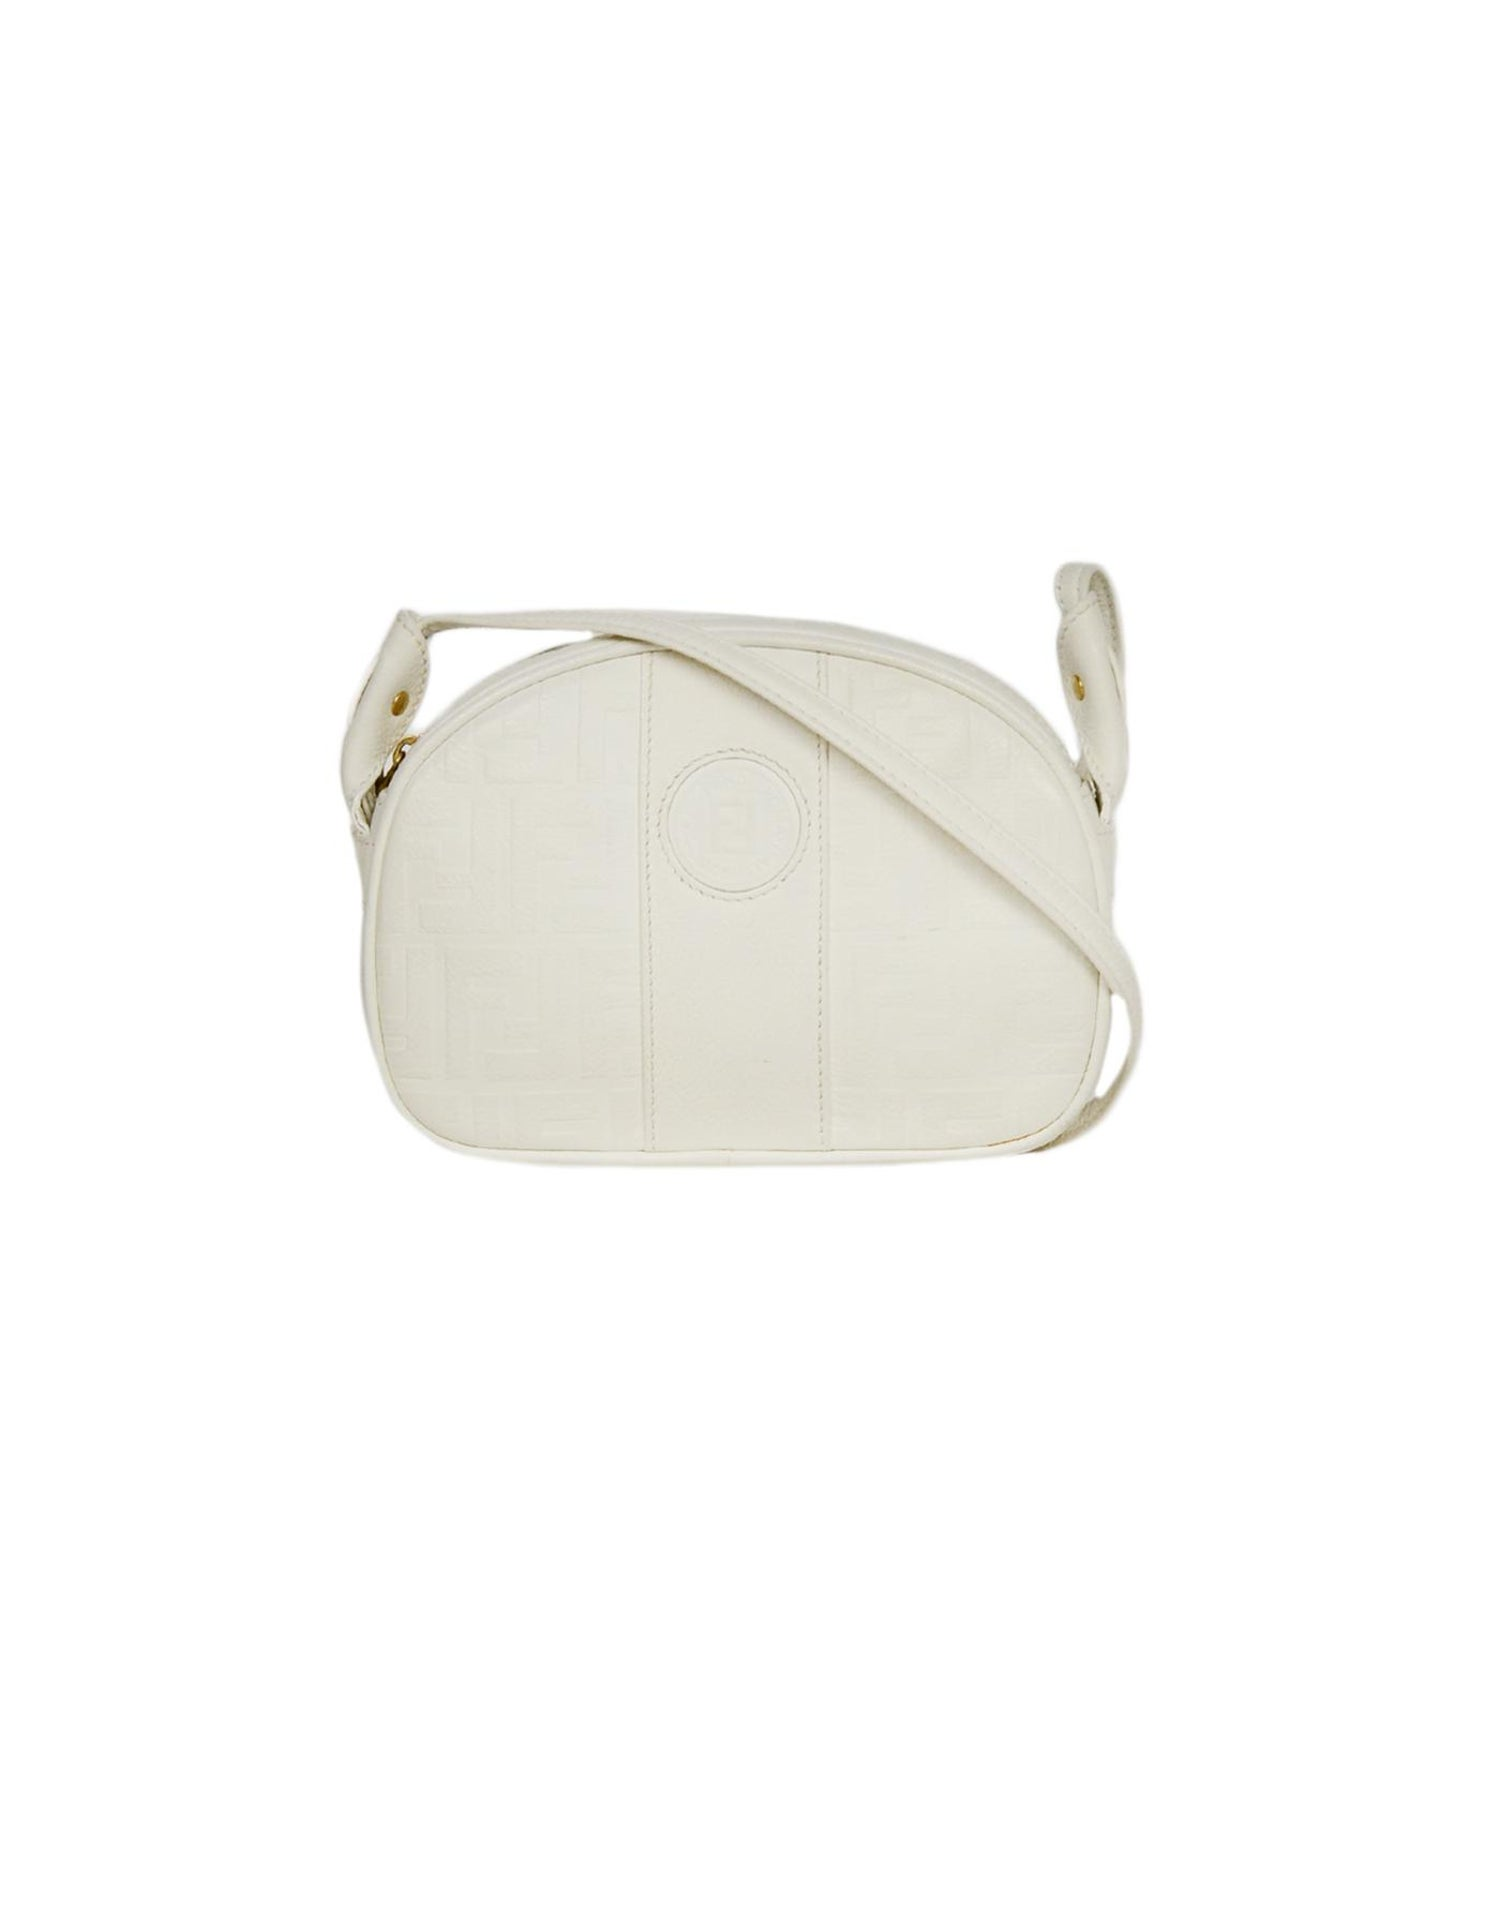 9d52a9ea Fendi Vintage White Leather Embossed Monogram Crossbody Bag